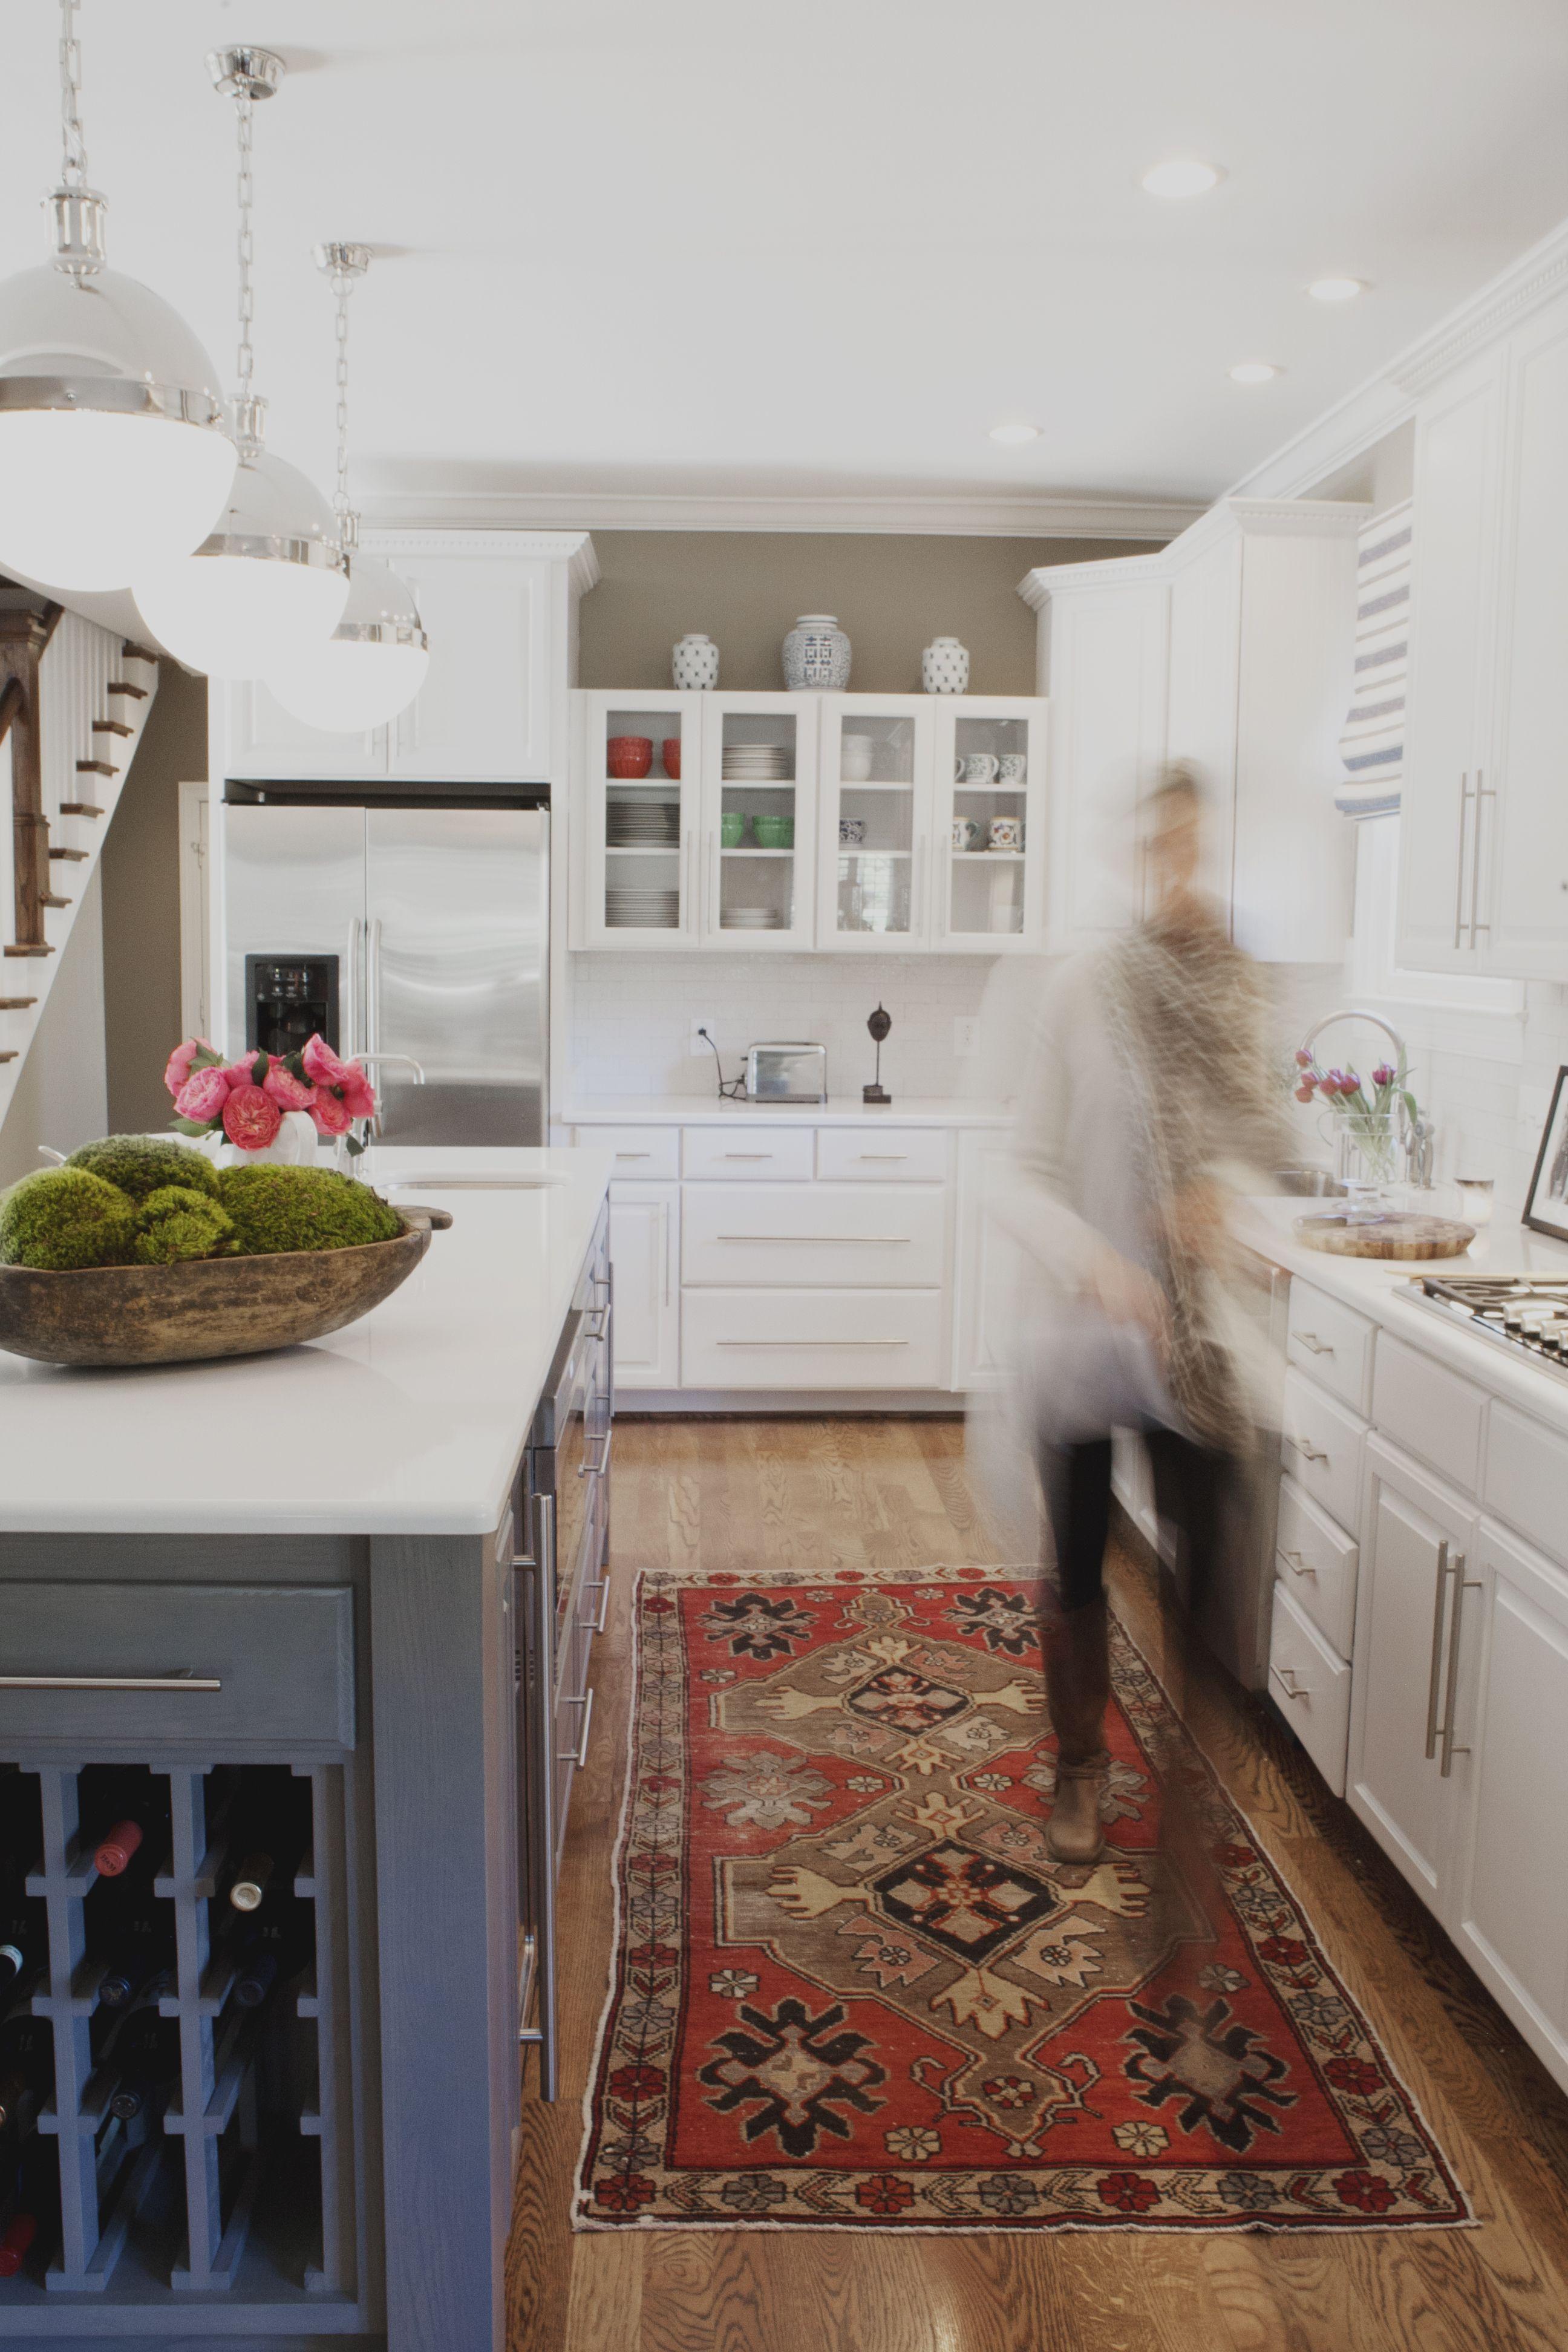 Superieur Nashville Kitchen Remodel, Benjamin Vandiver, Blue Island, White Cabinets,  Hicks Pendants, Blue Striped Window Shade